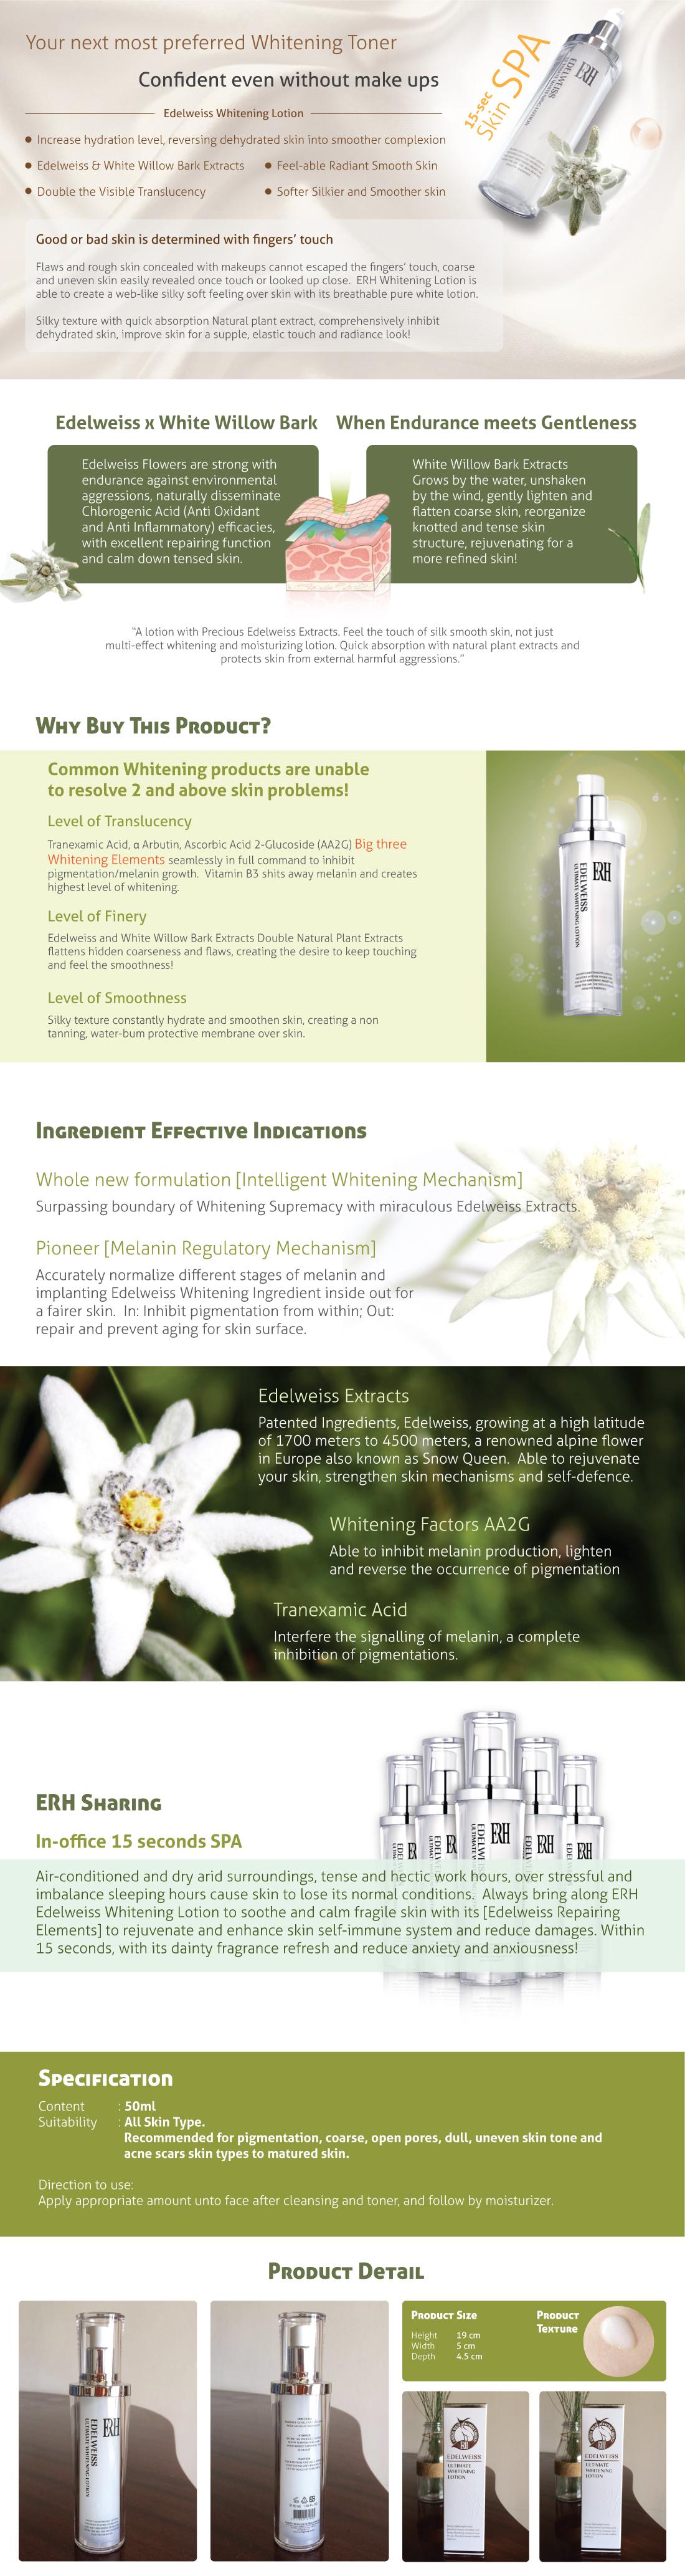 ERH Edelweiss Ultimate Whitening Lotion 50ML